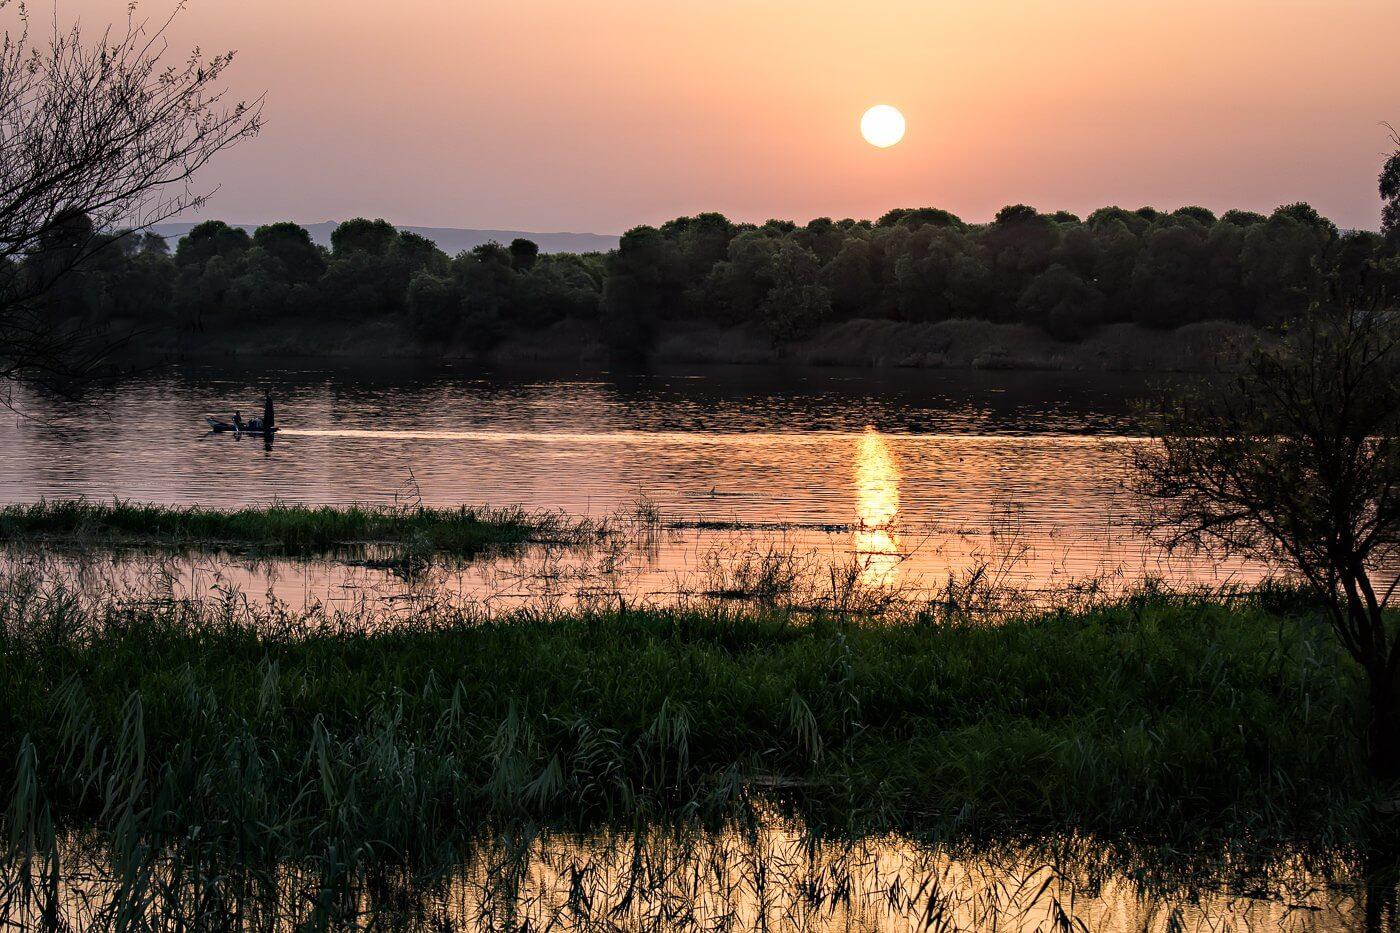 Sunset over the Nile, Luxor, Egypt - Photo by Zed Sindelar of CuriousZed Photography